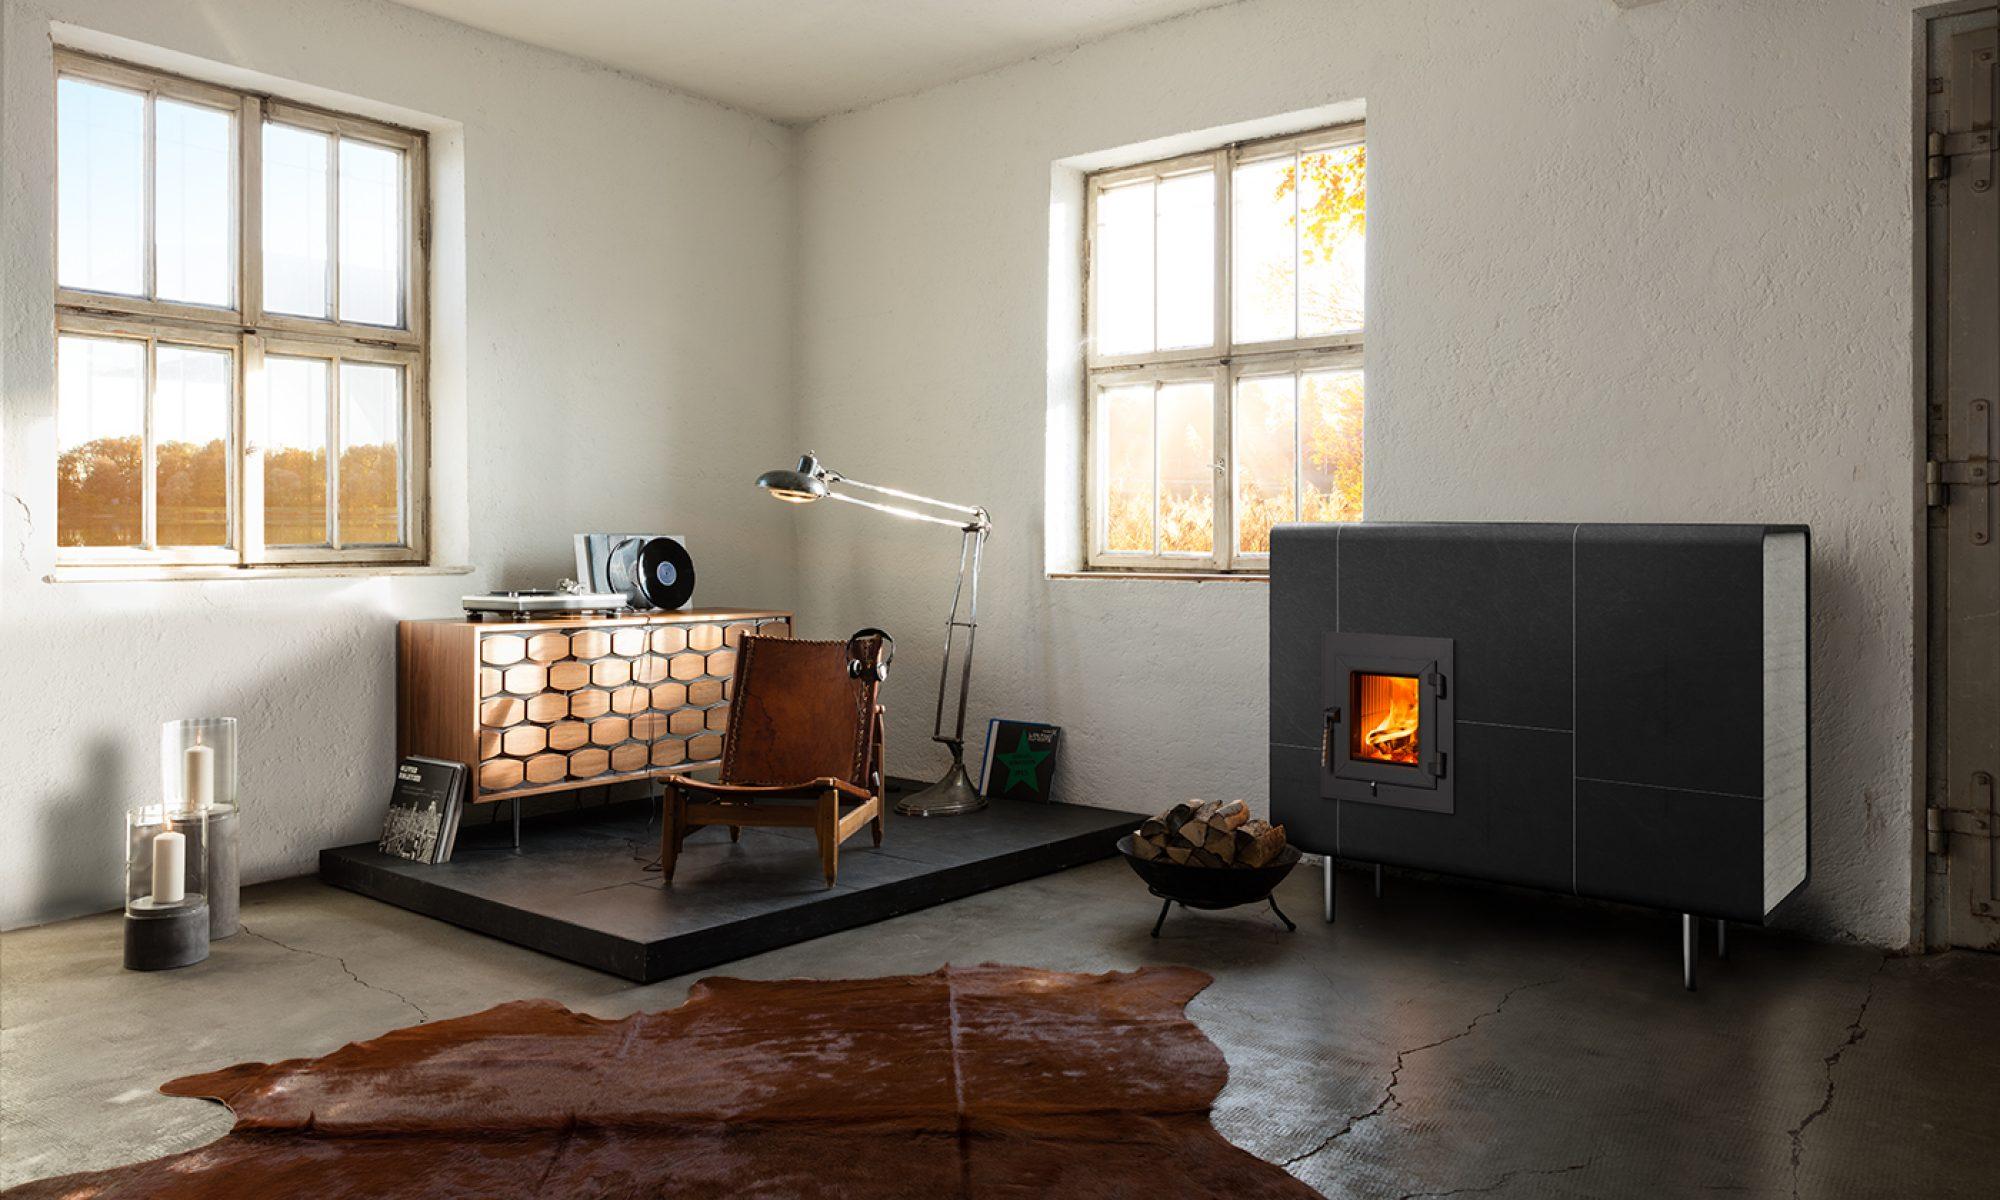 brennholz-total.de